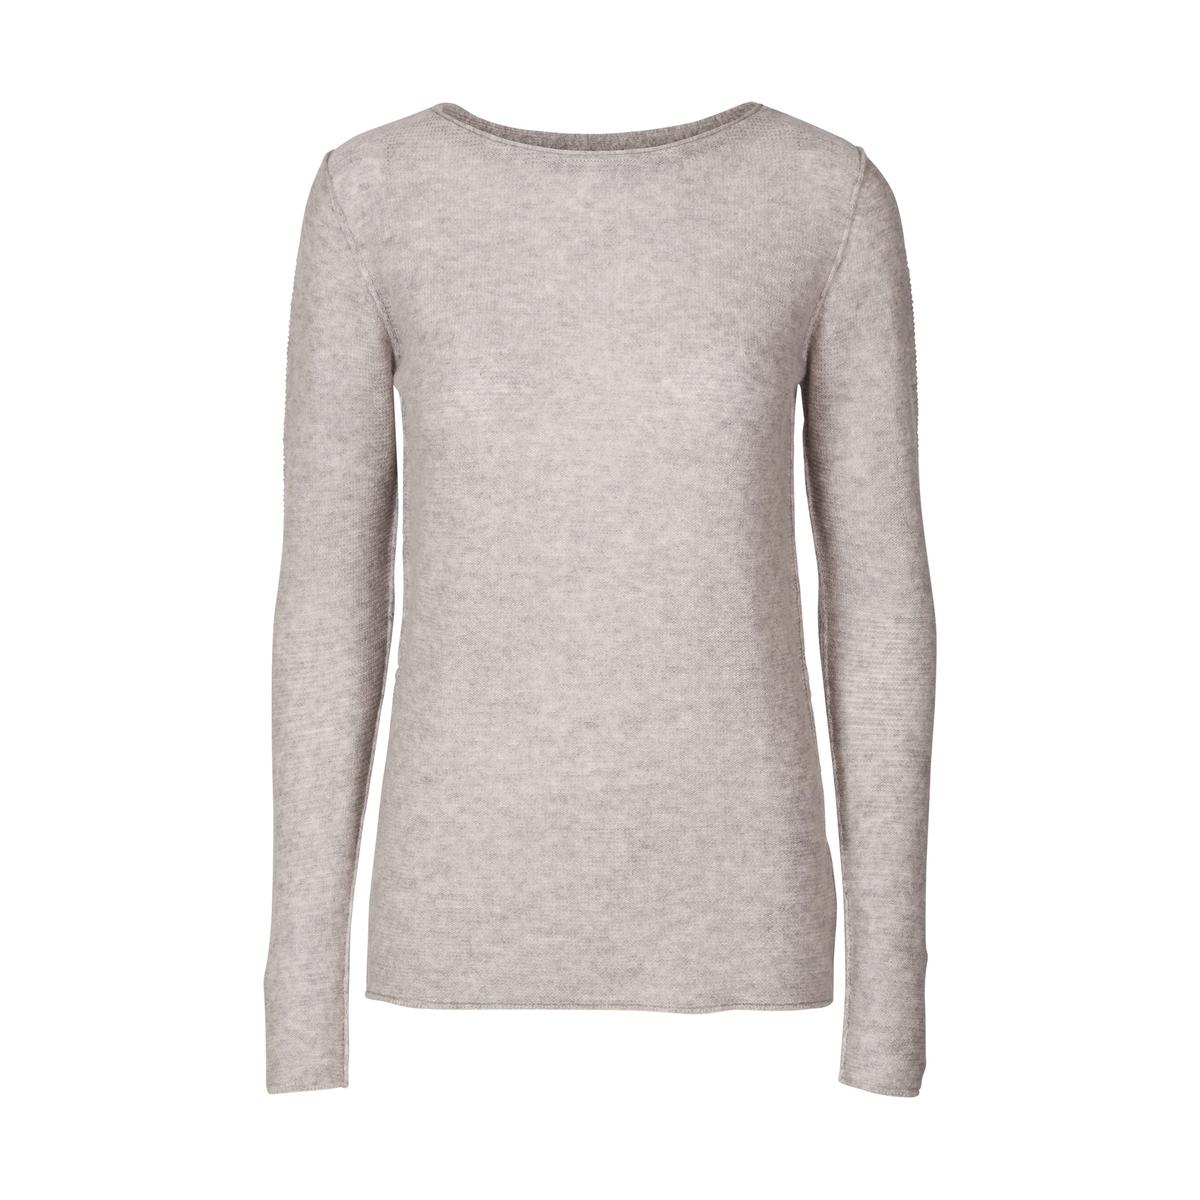 Пуловер из тонкого трикотажа из шерсти и кашемира от AND LESS